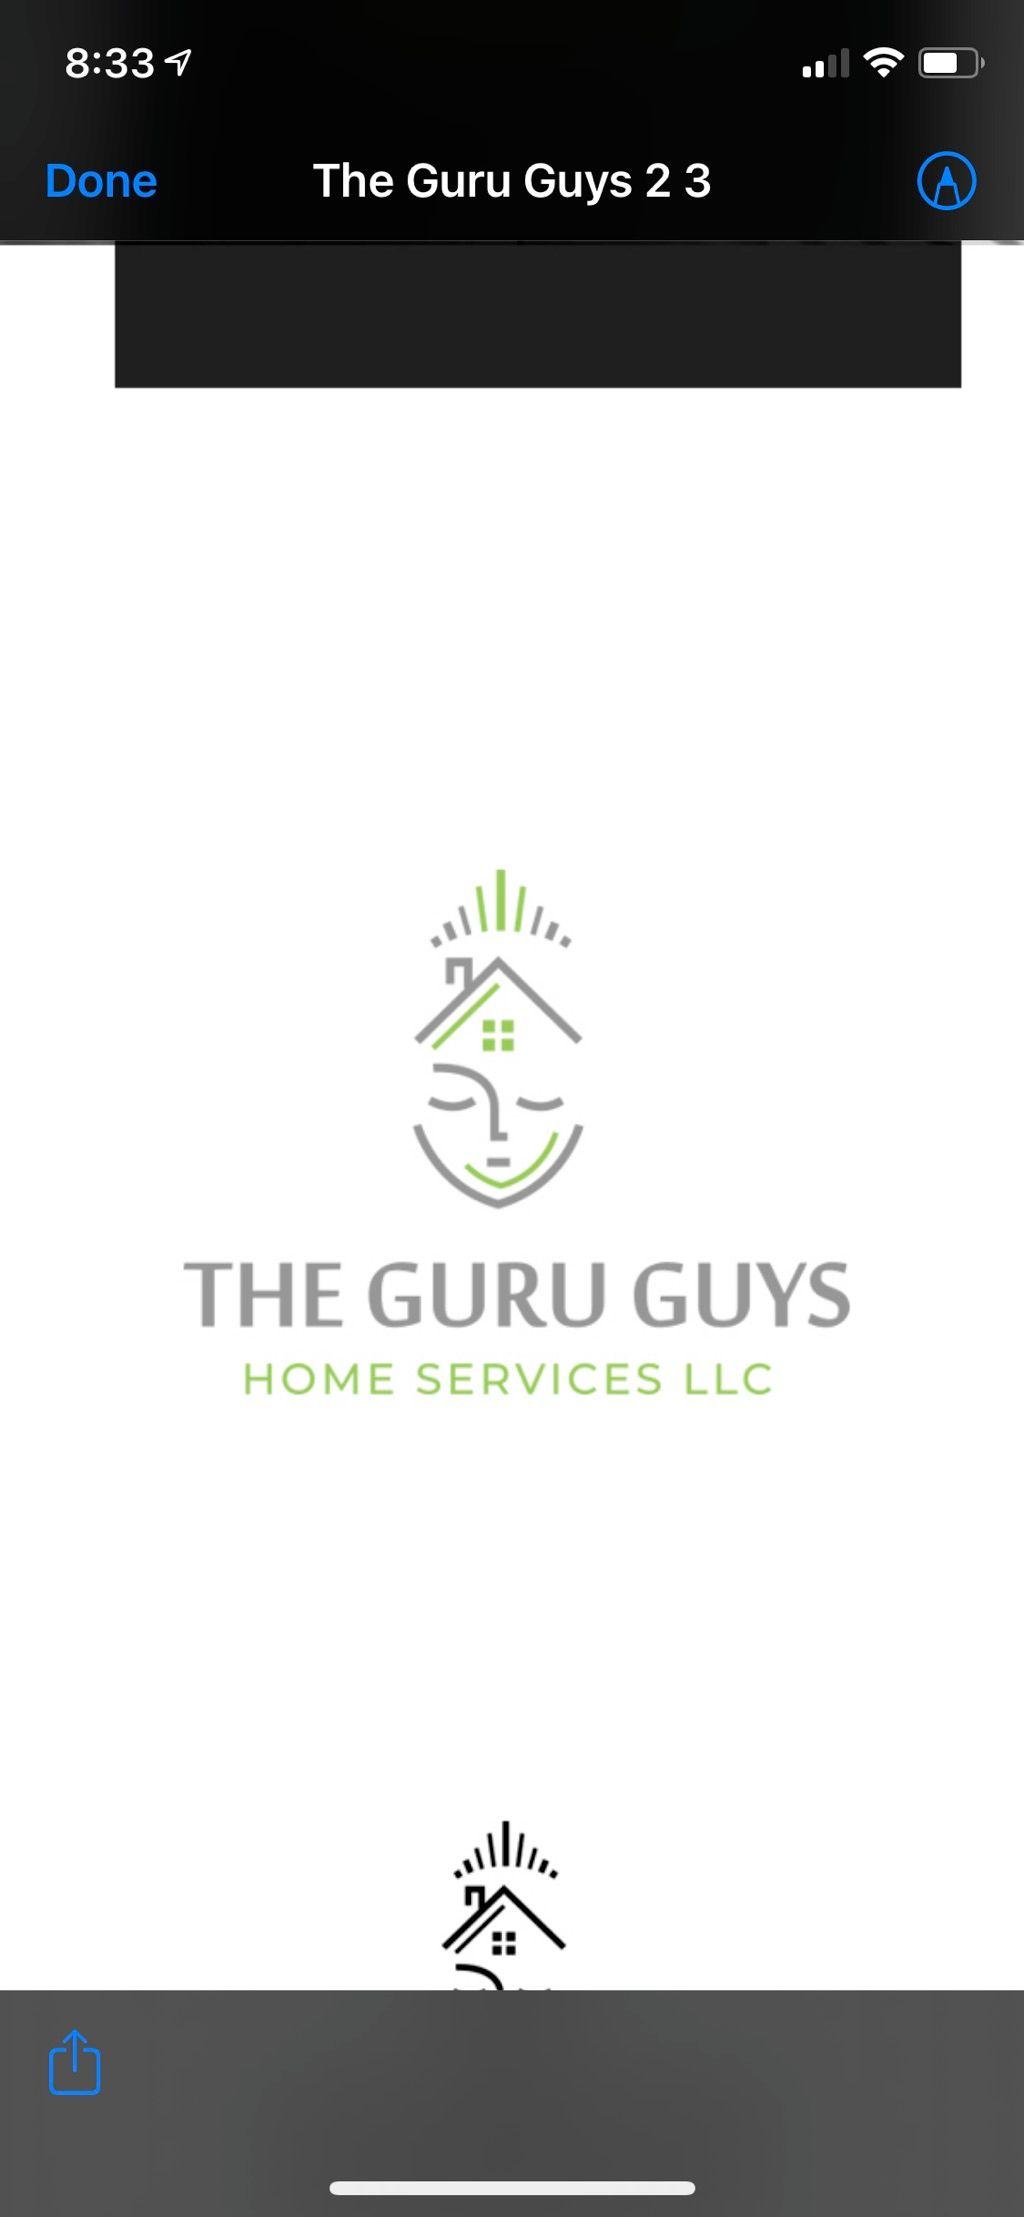 The Guru Guys Home Services LLC